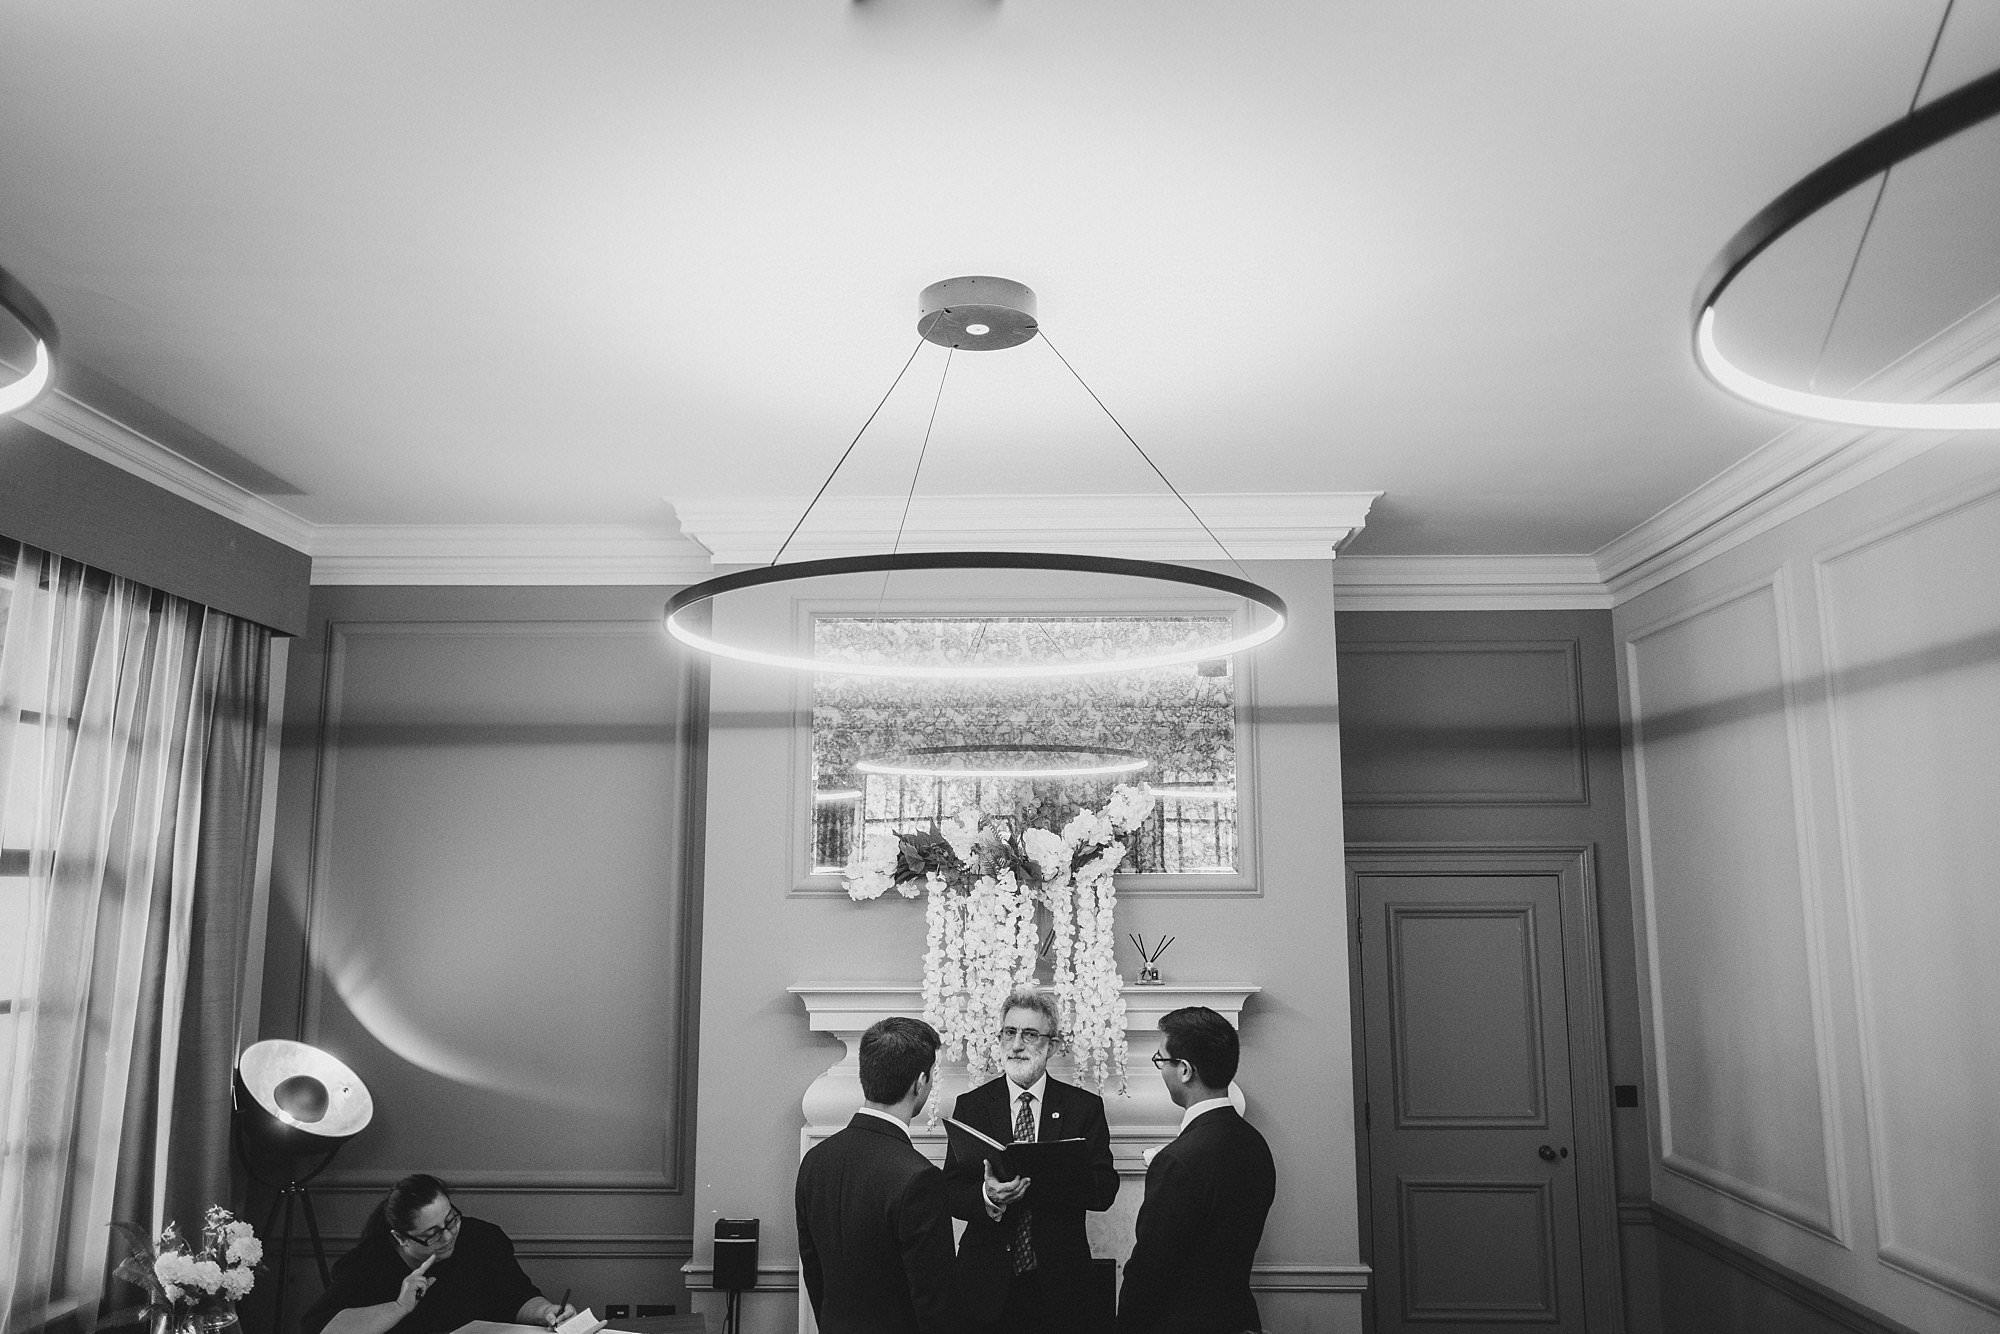 old marylebone town hall wedding photographer wedding jh 016 - Hugo + Josh   Marylebone